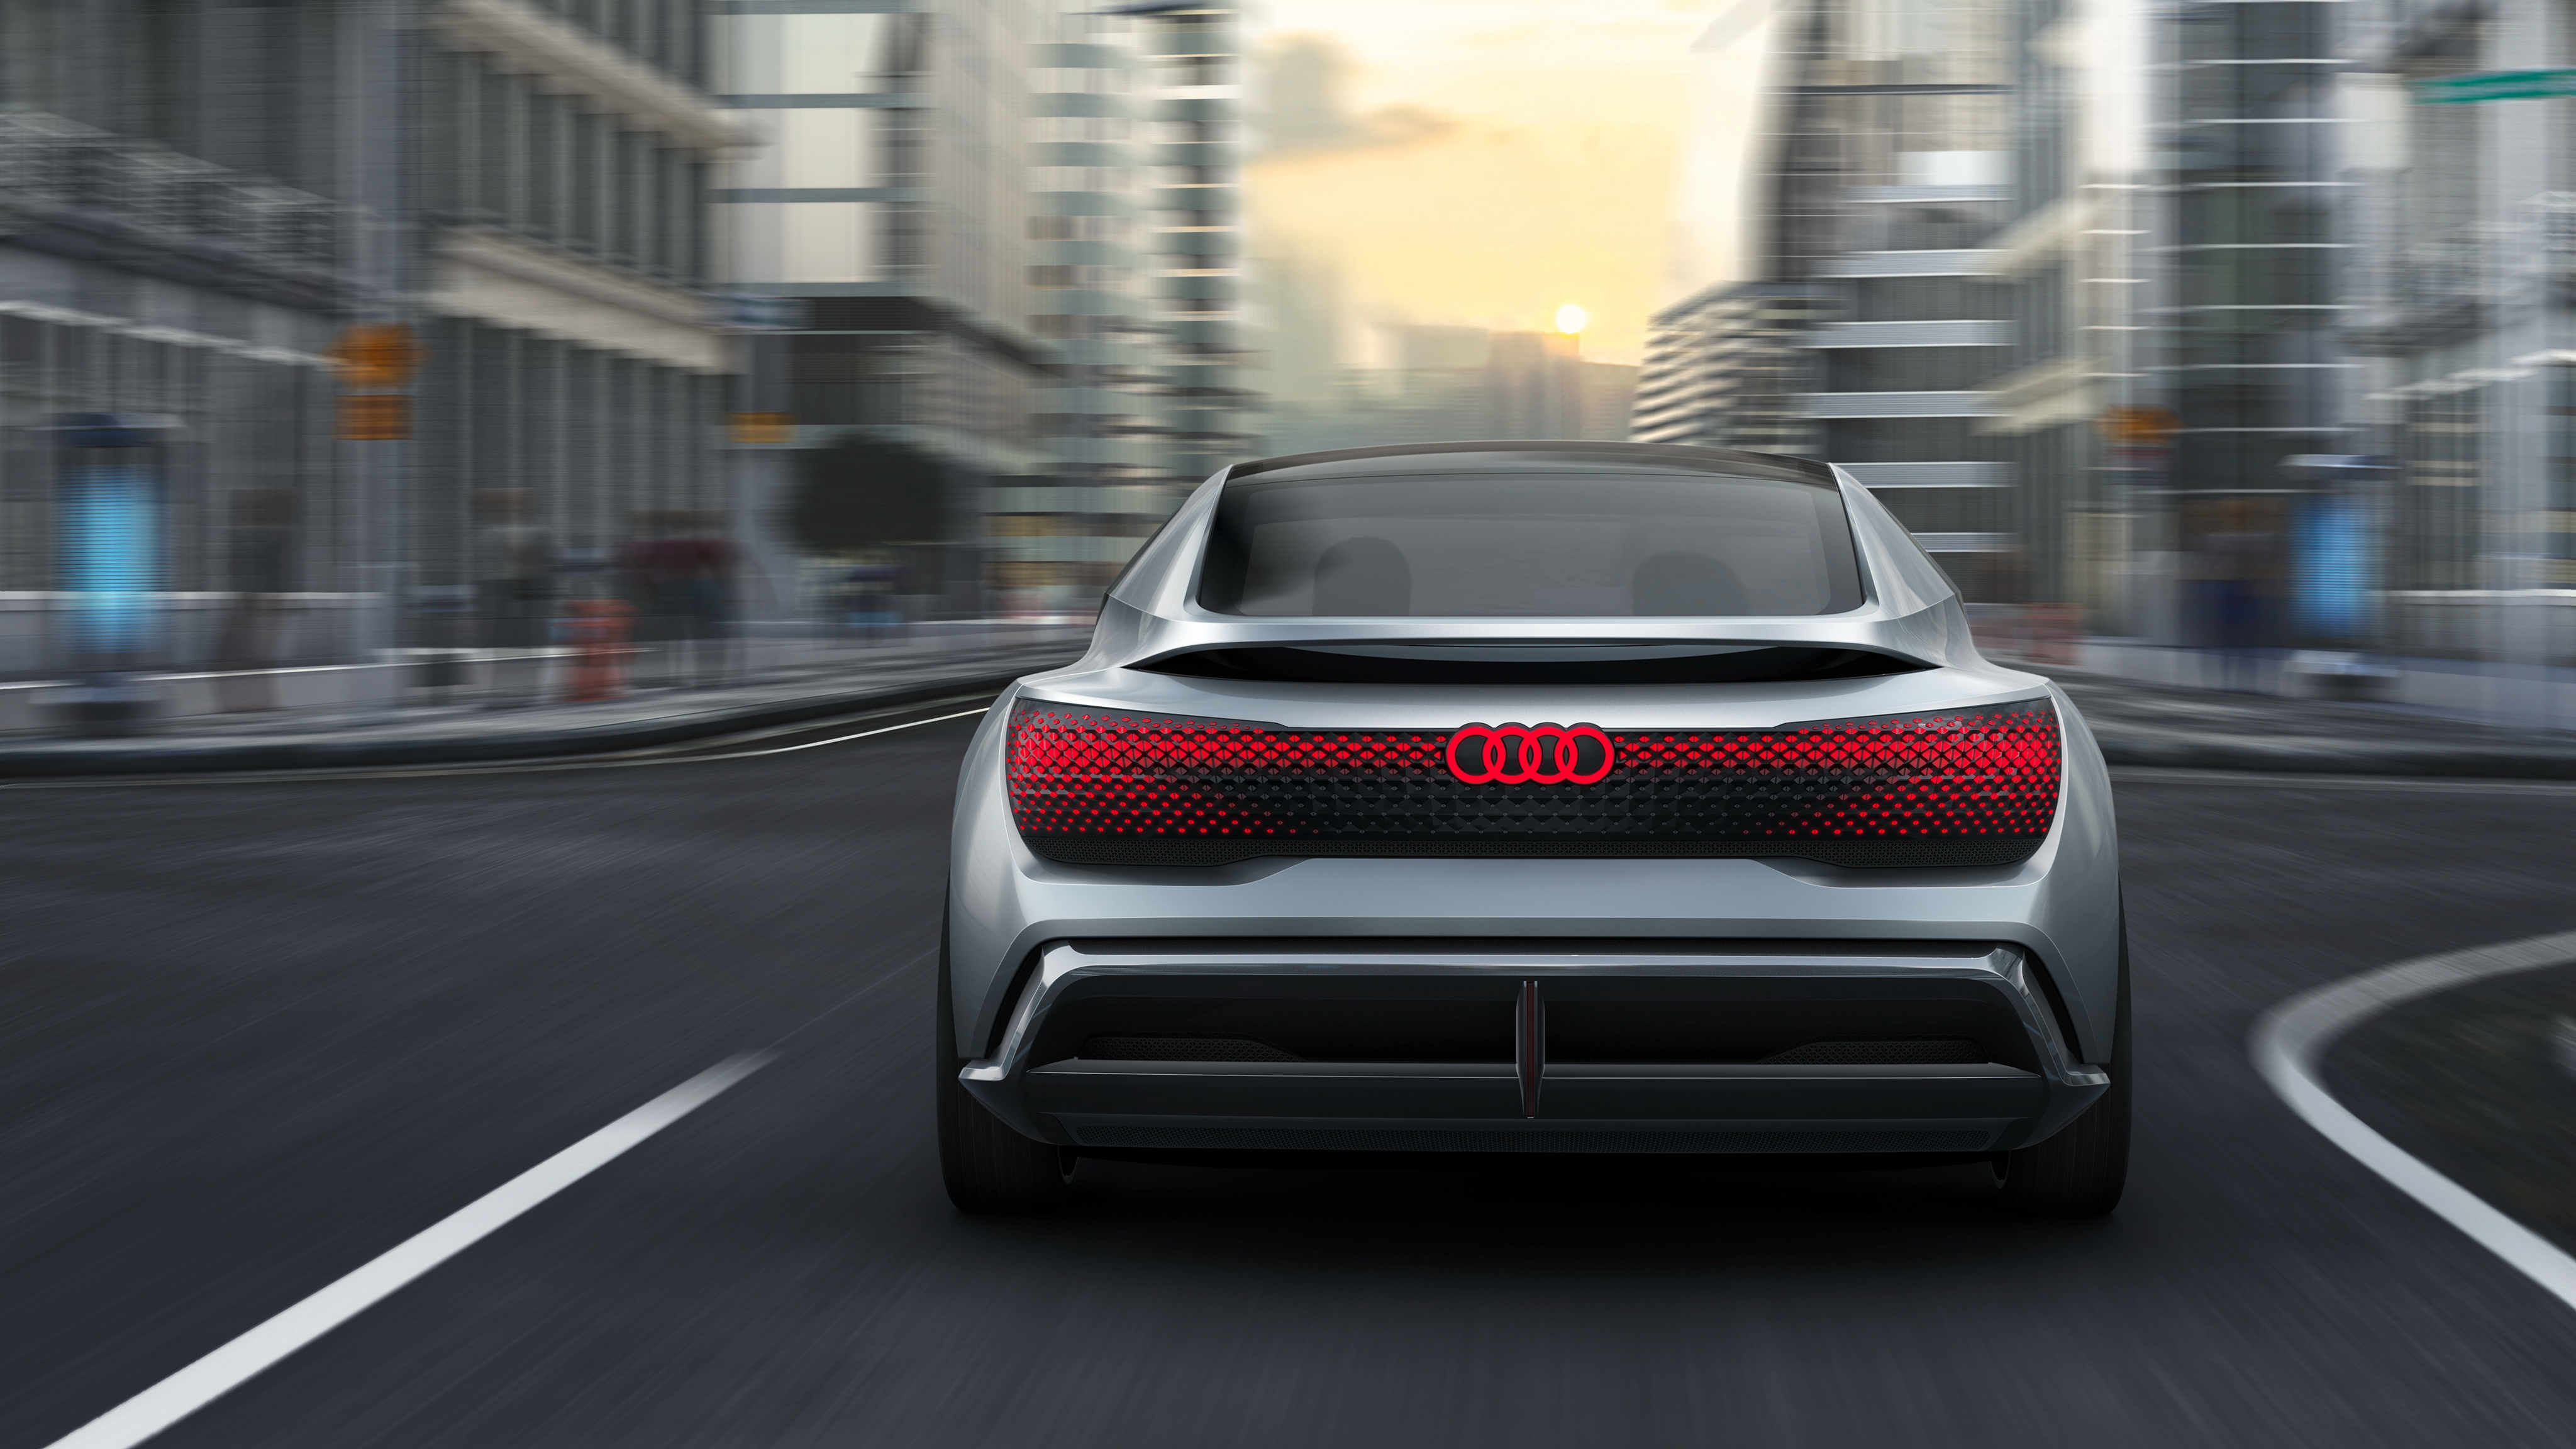 Audi Aicon Frankfurt Motor Show 2017 4k